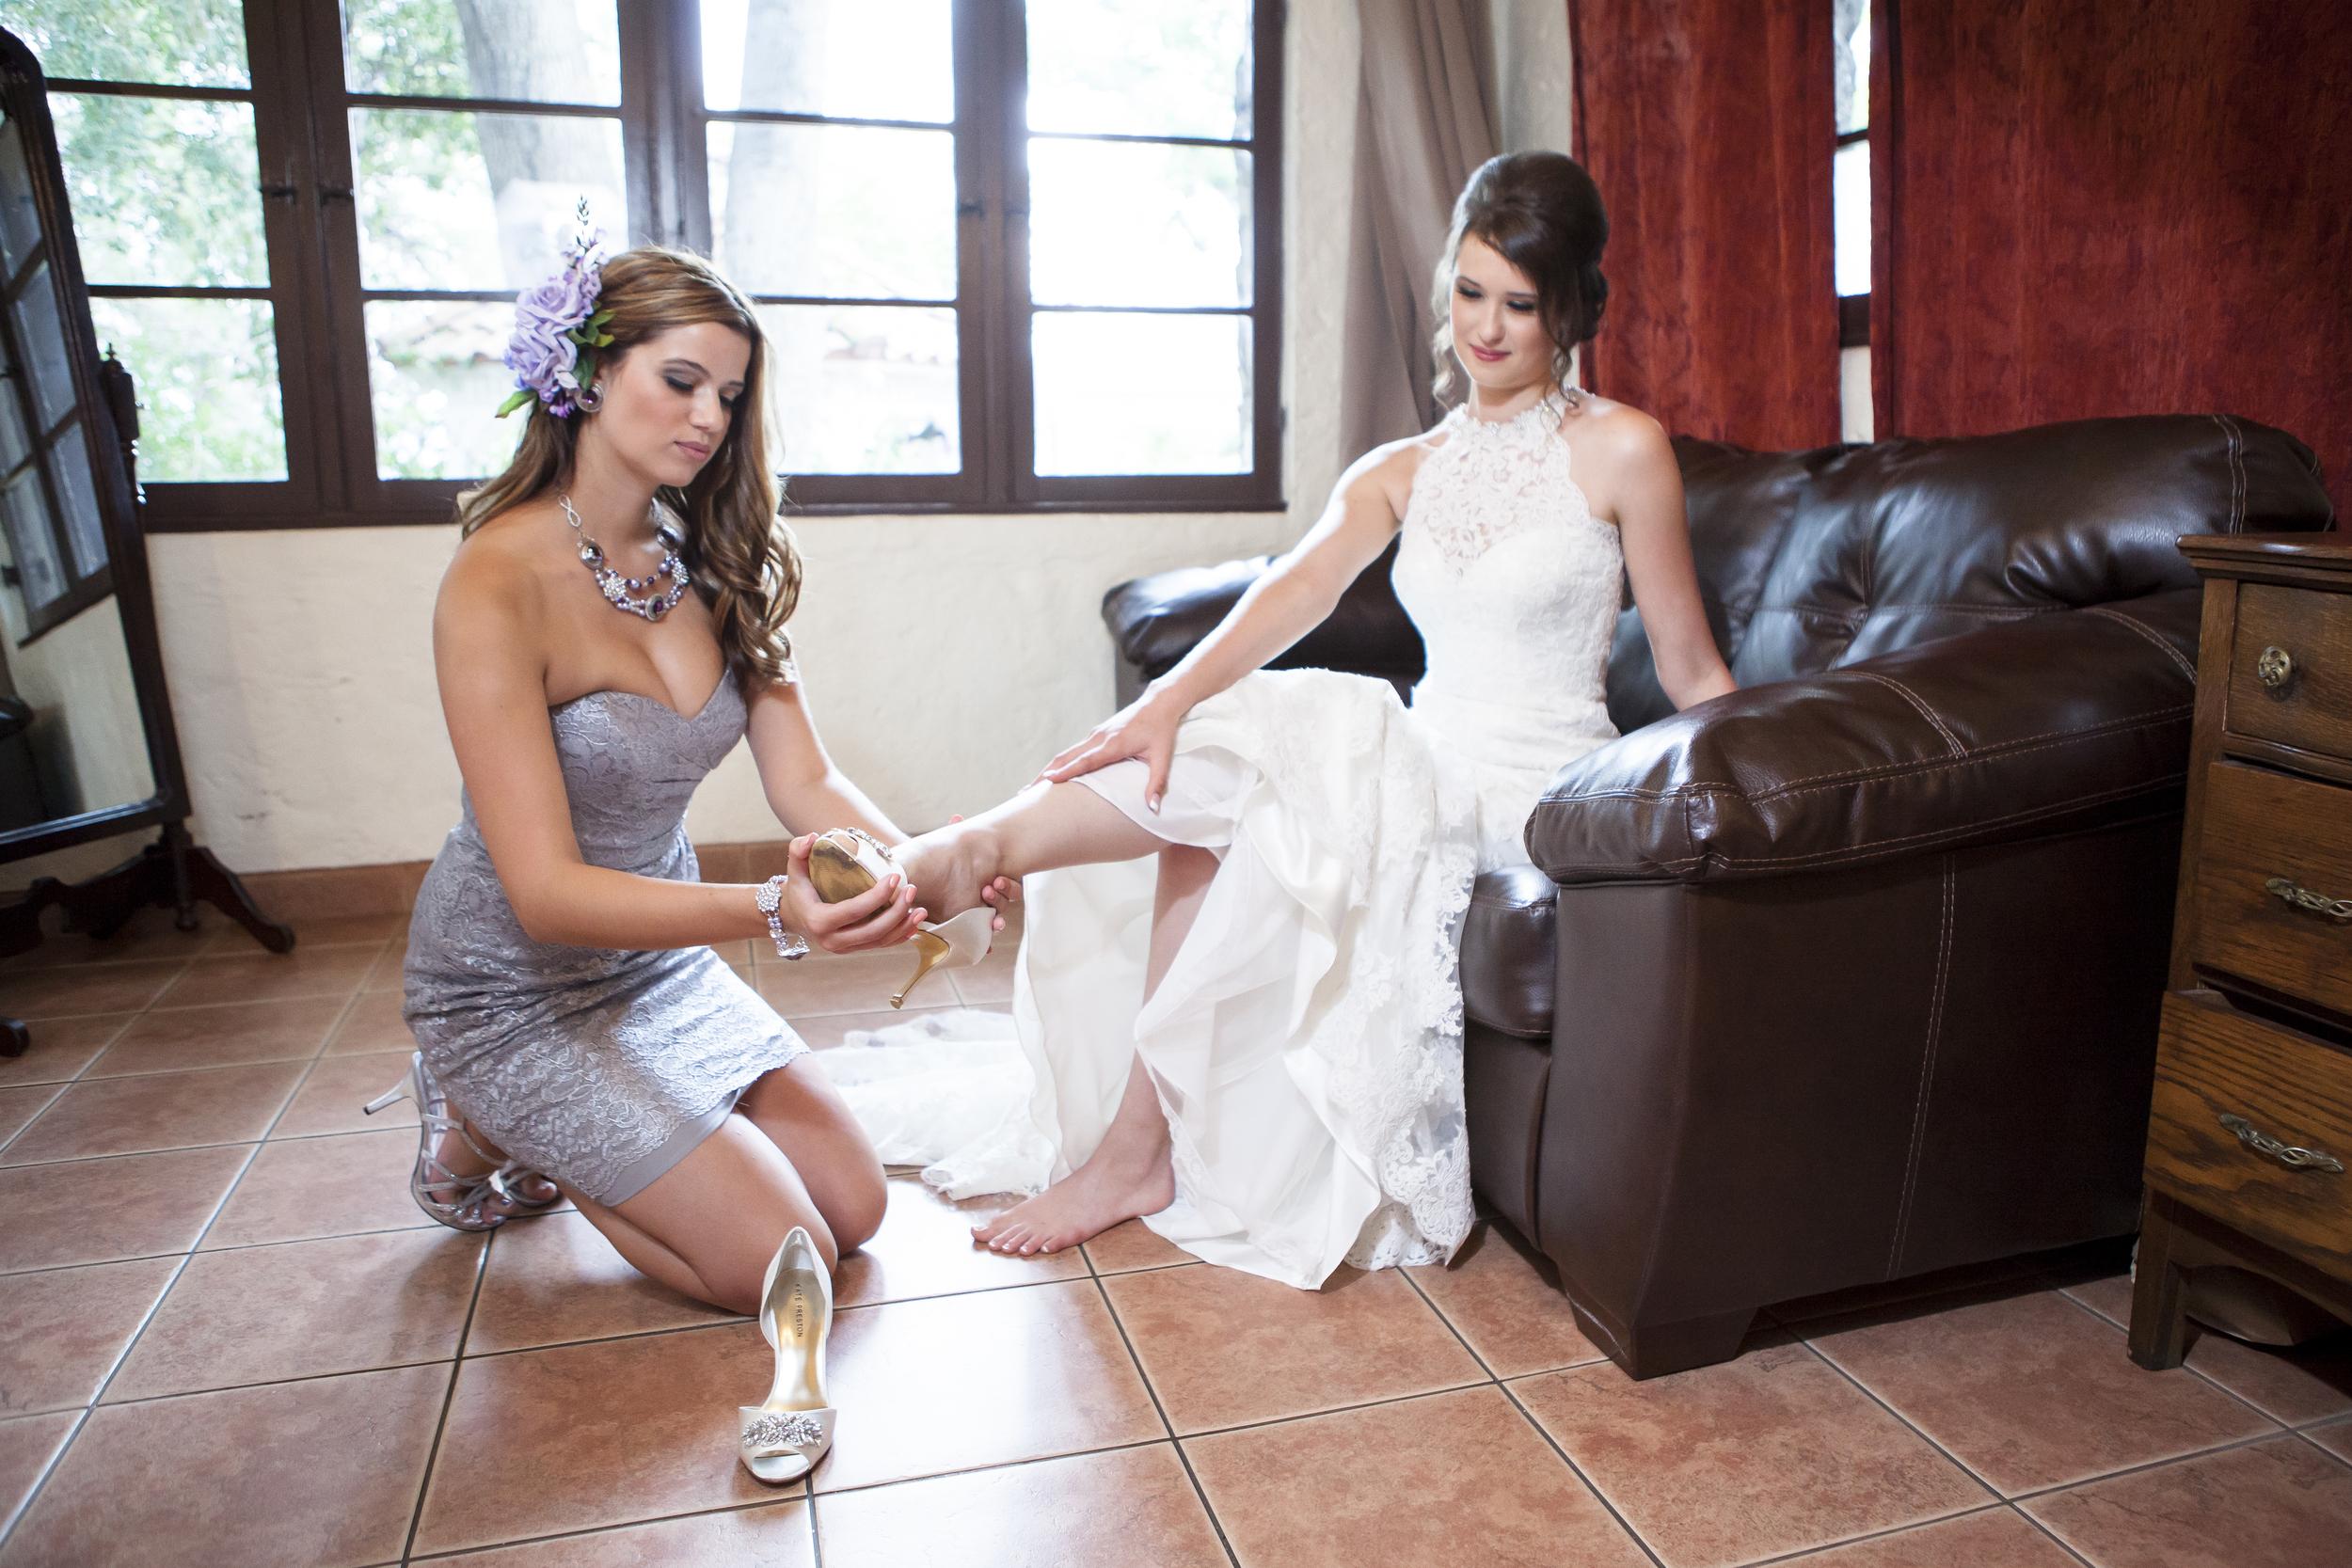 Duvall-Tkatch Wedding-B-191.jpg